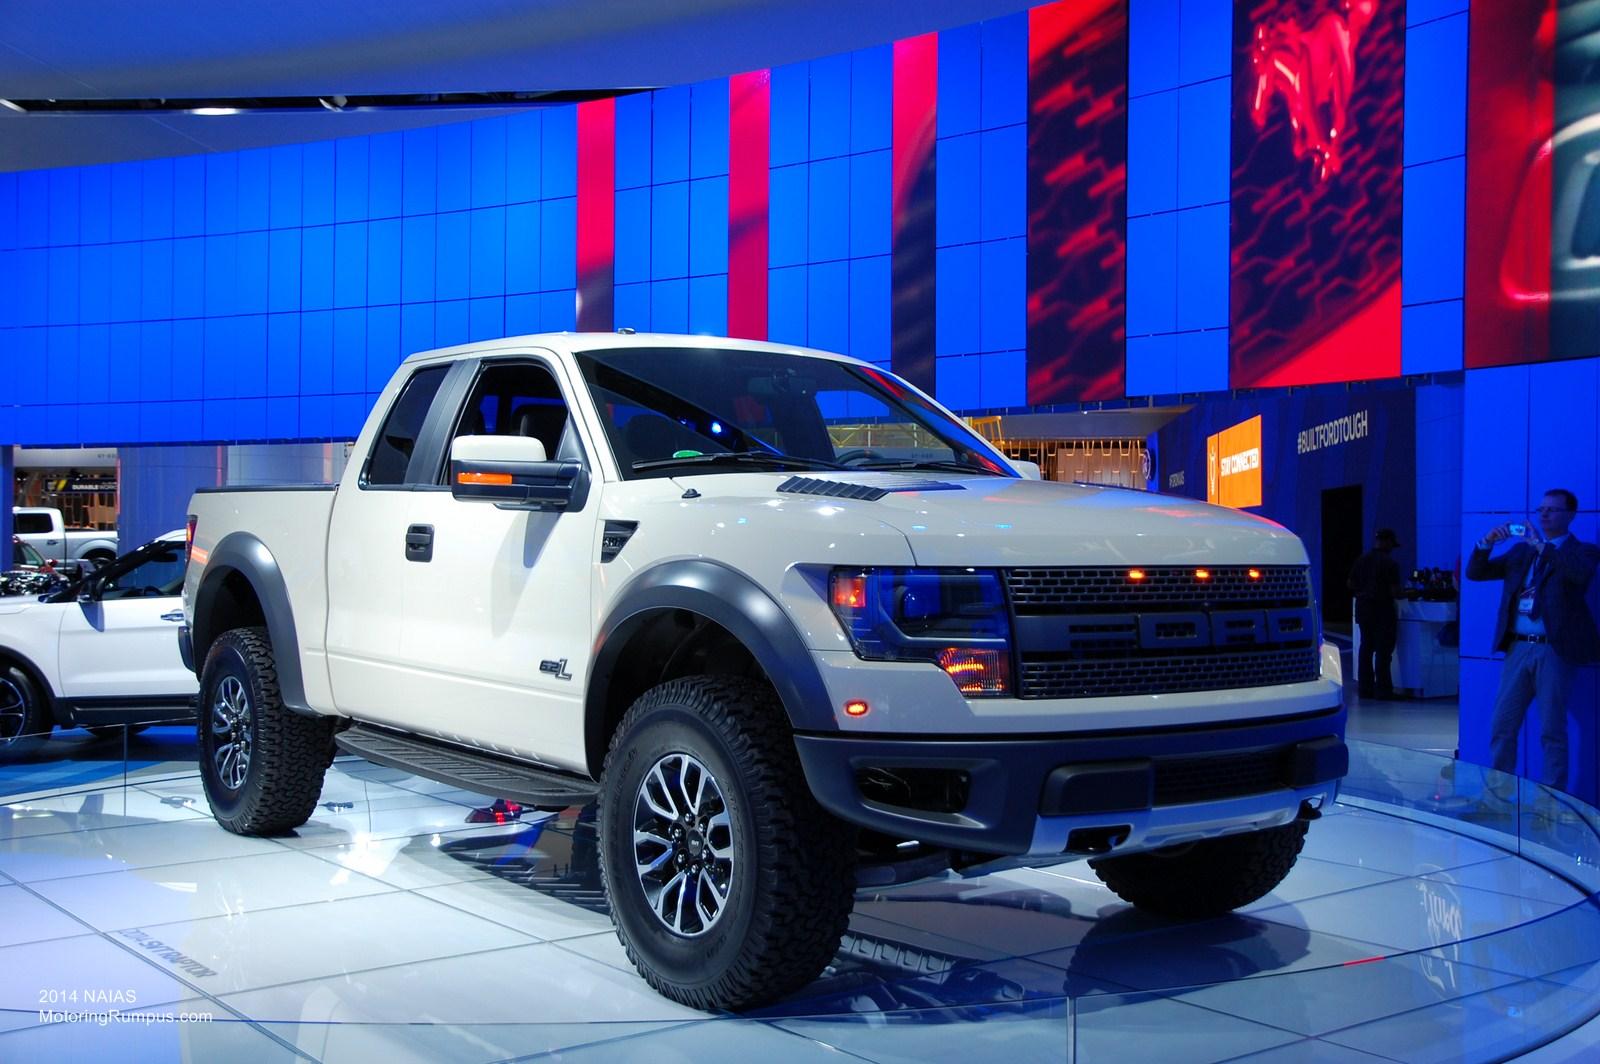 2014 NAIAS Ford SVT Raptor